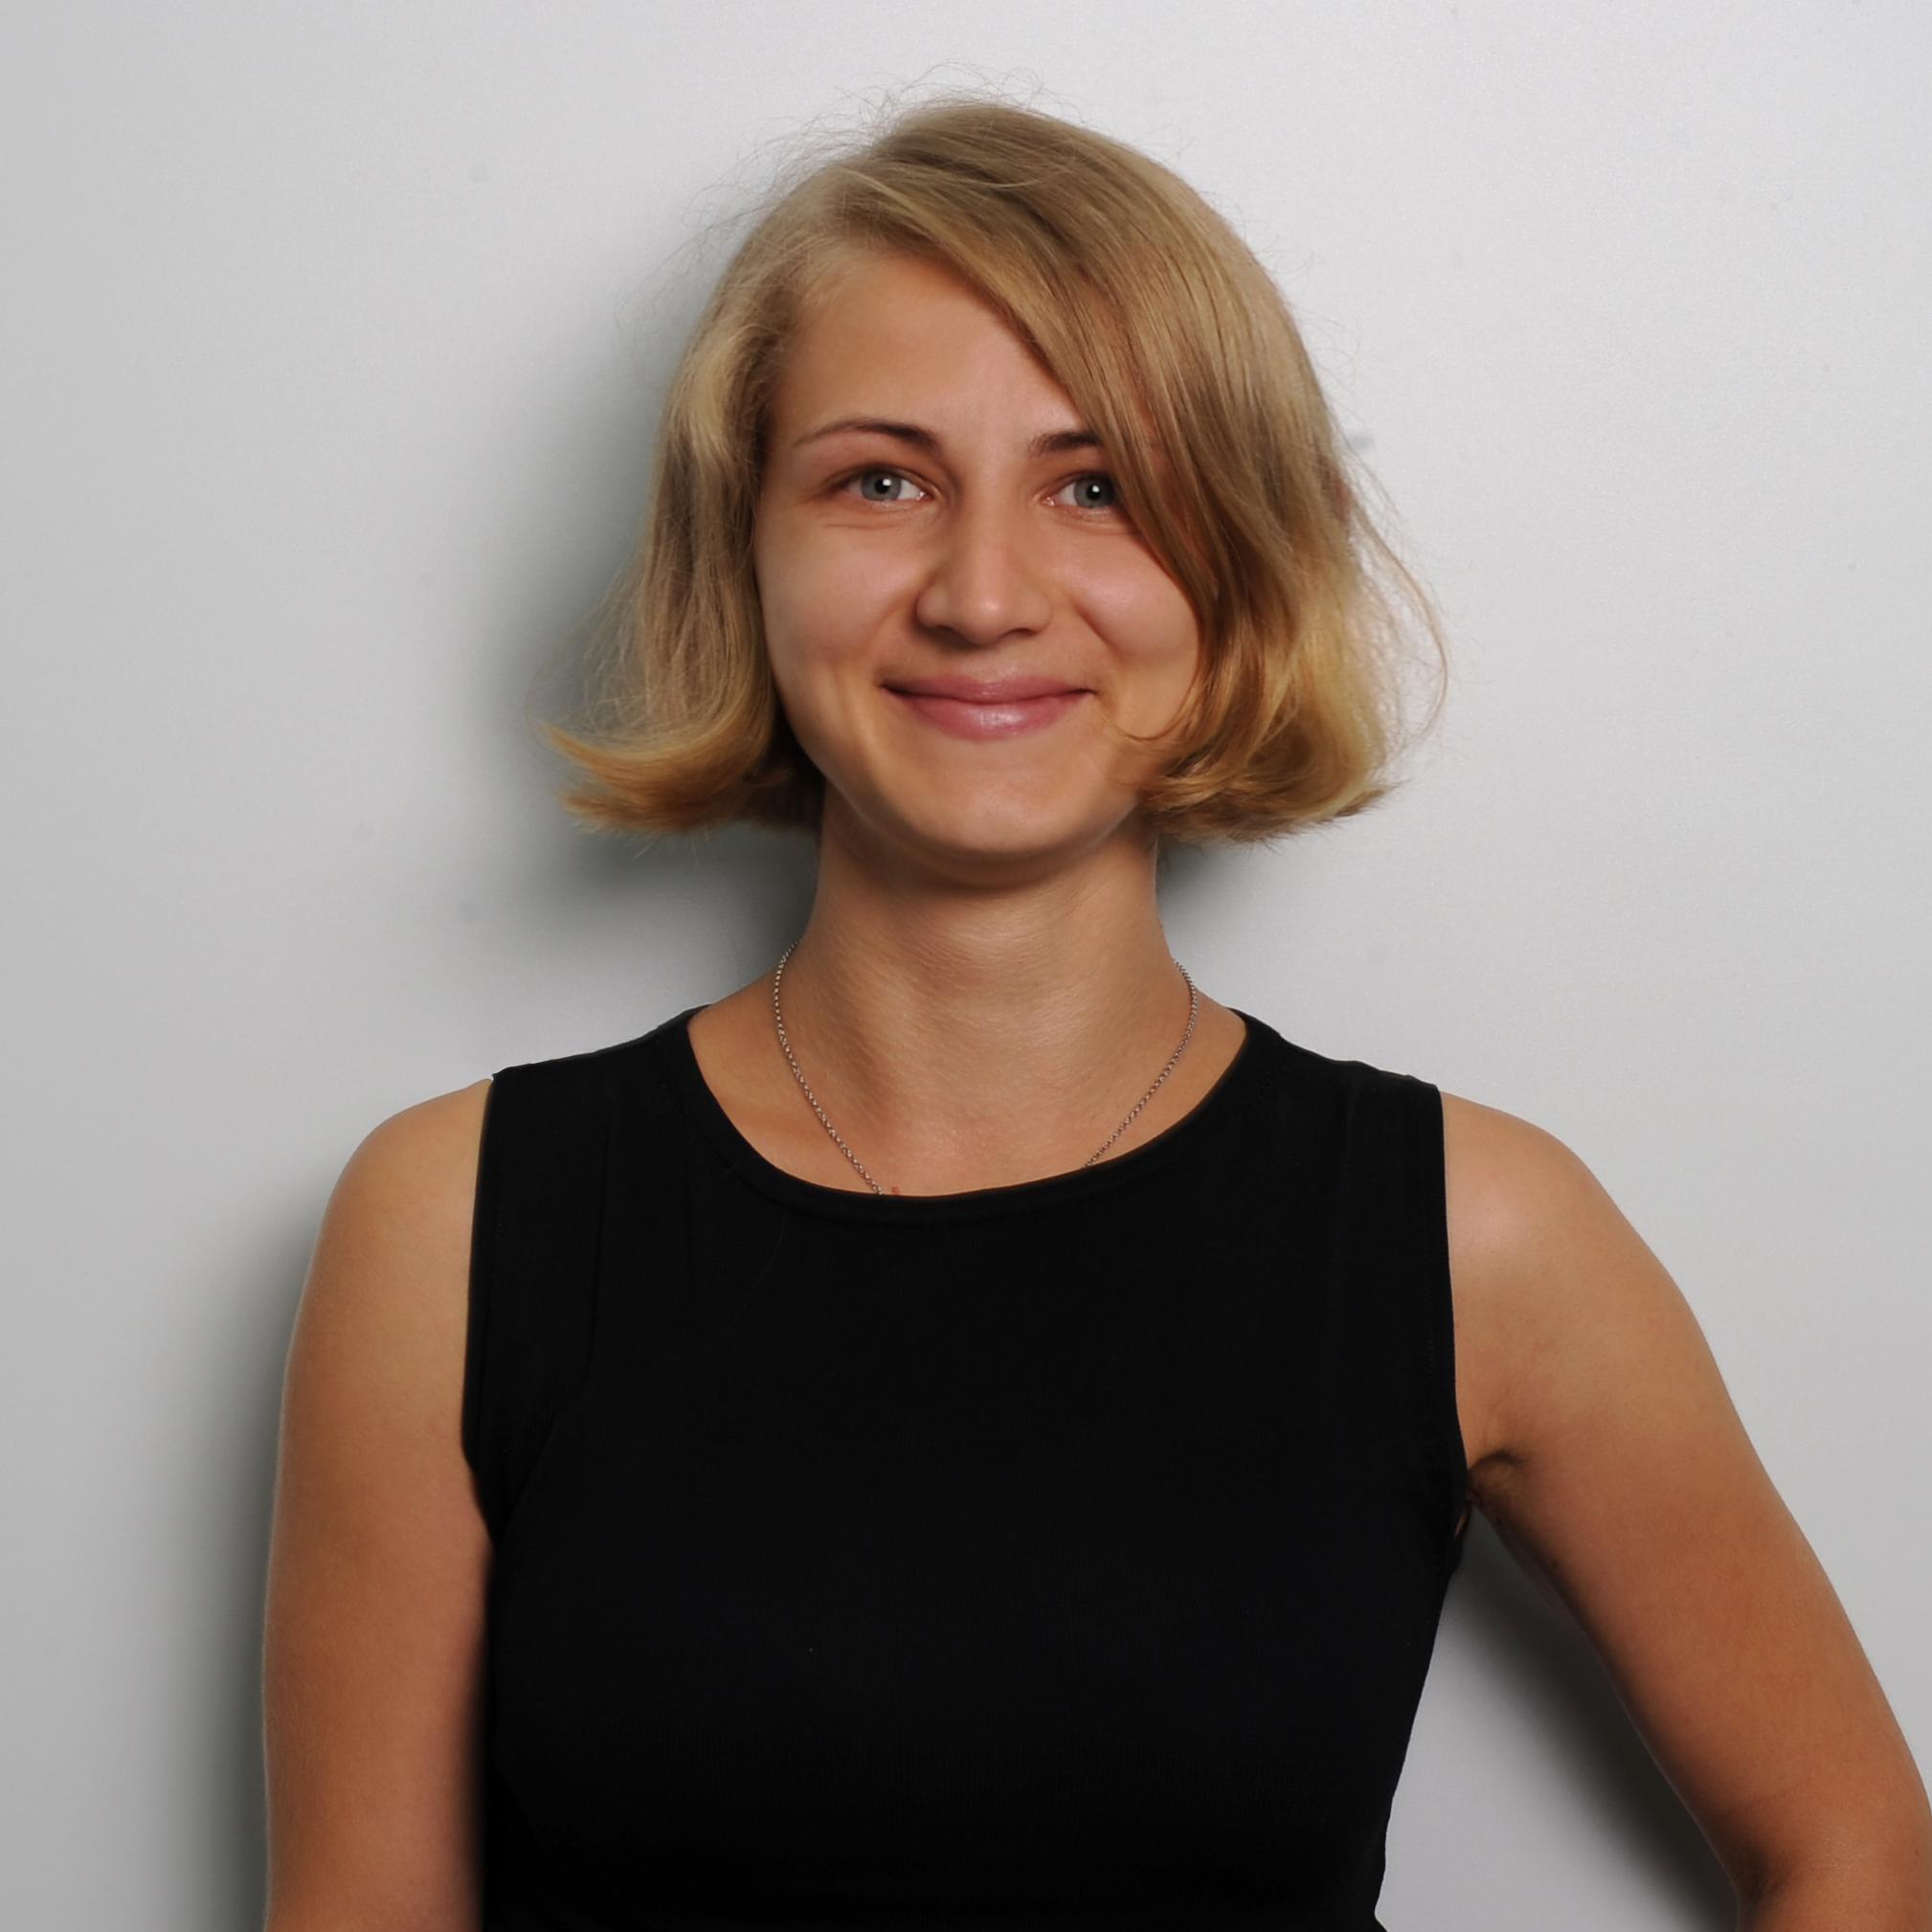 Olena Pysina